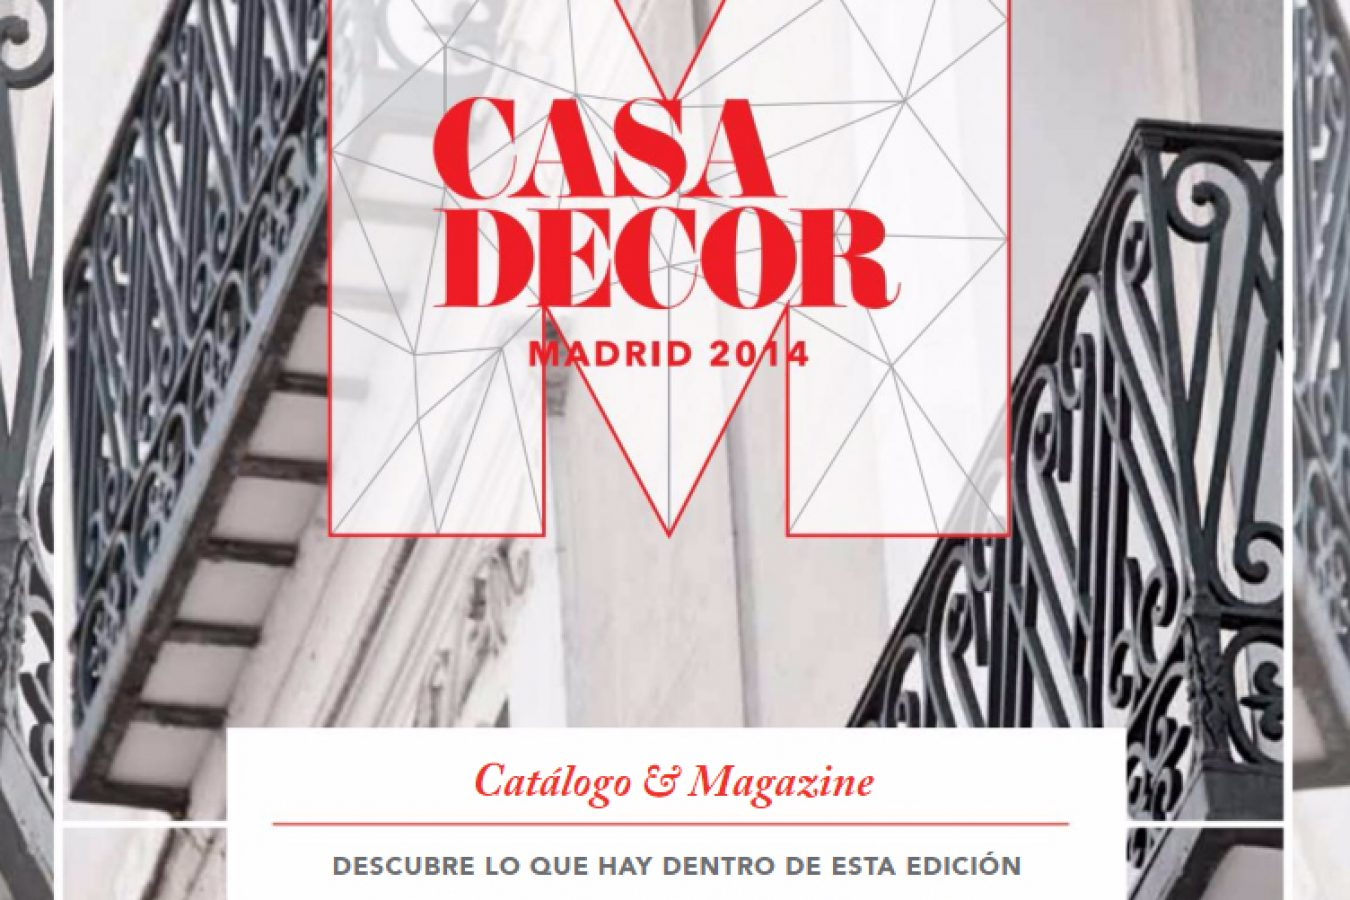 CasaDecor 2014 Magazine ____________________